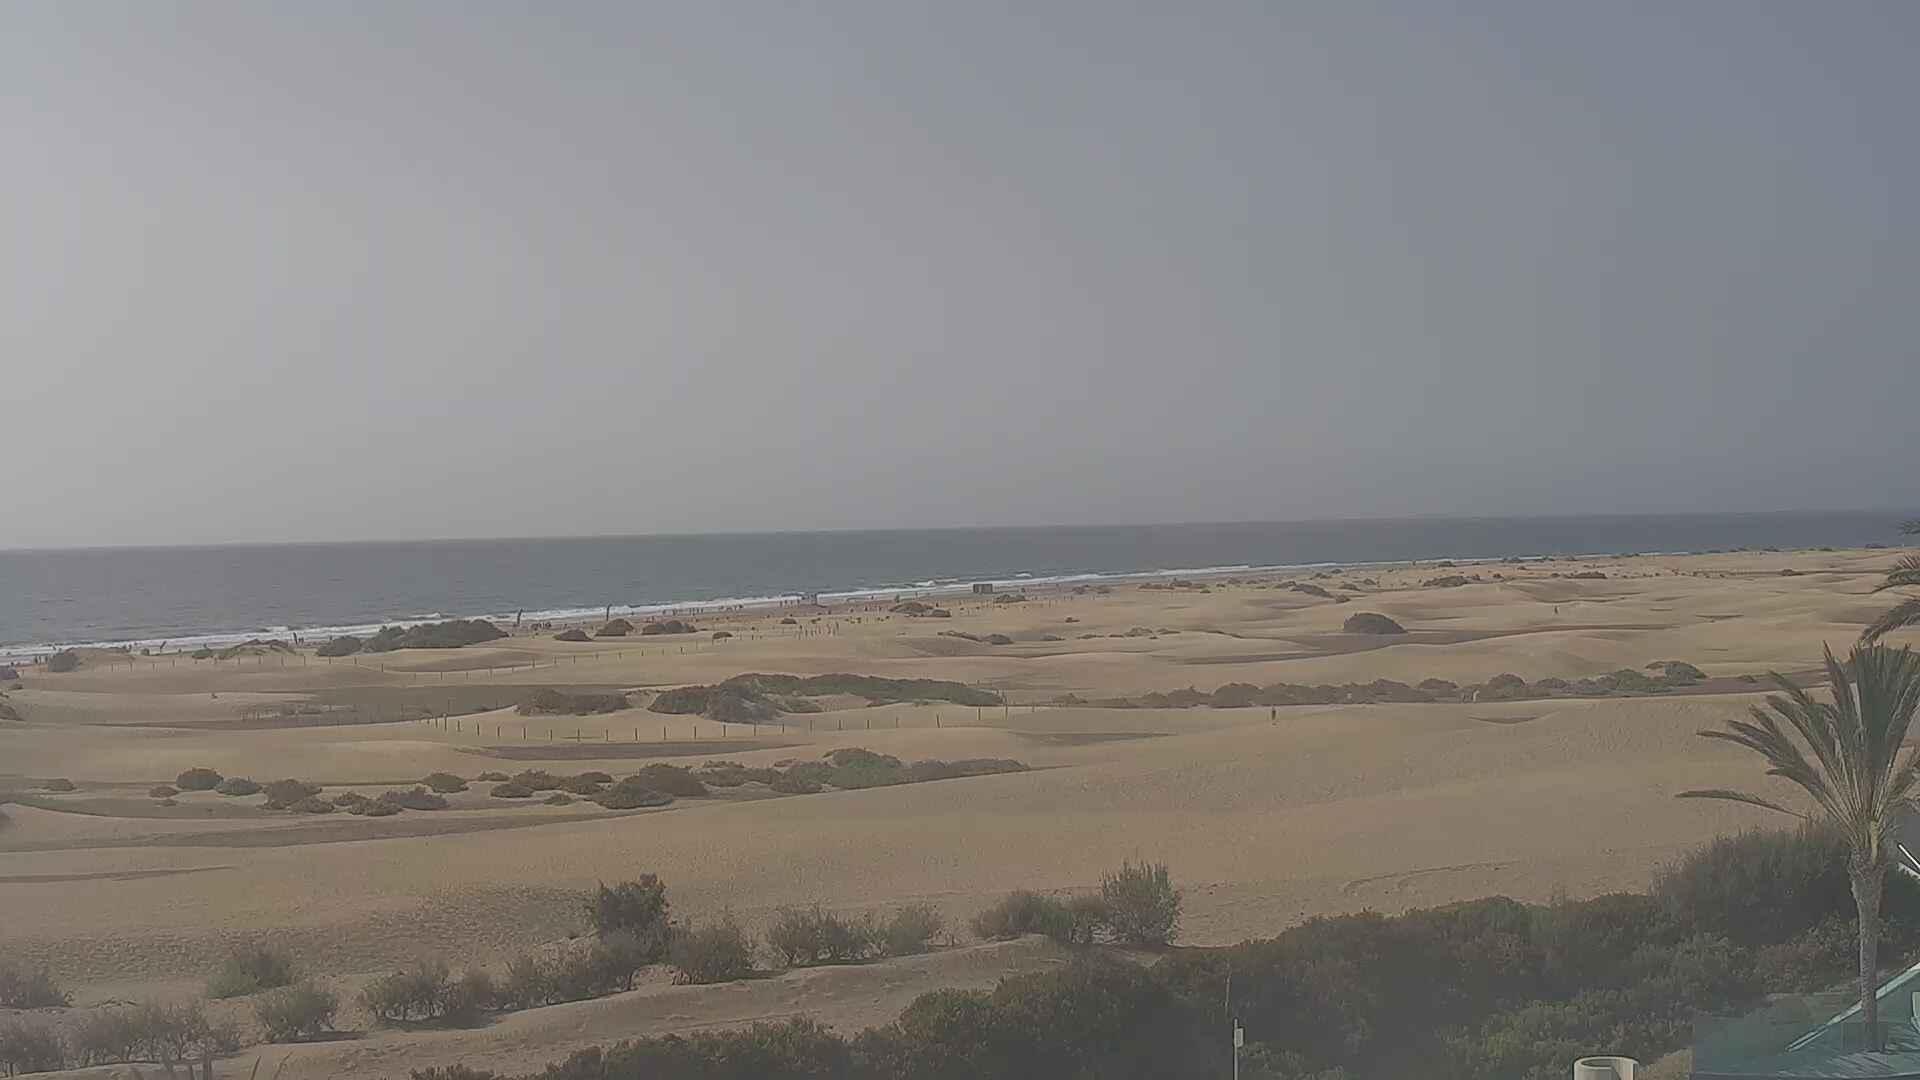 Playa del Ingles (Gran Canaria) Sat. 10:36